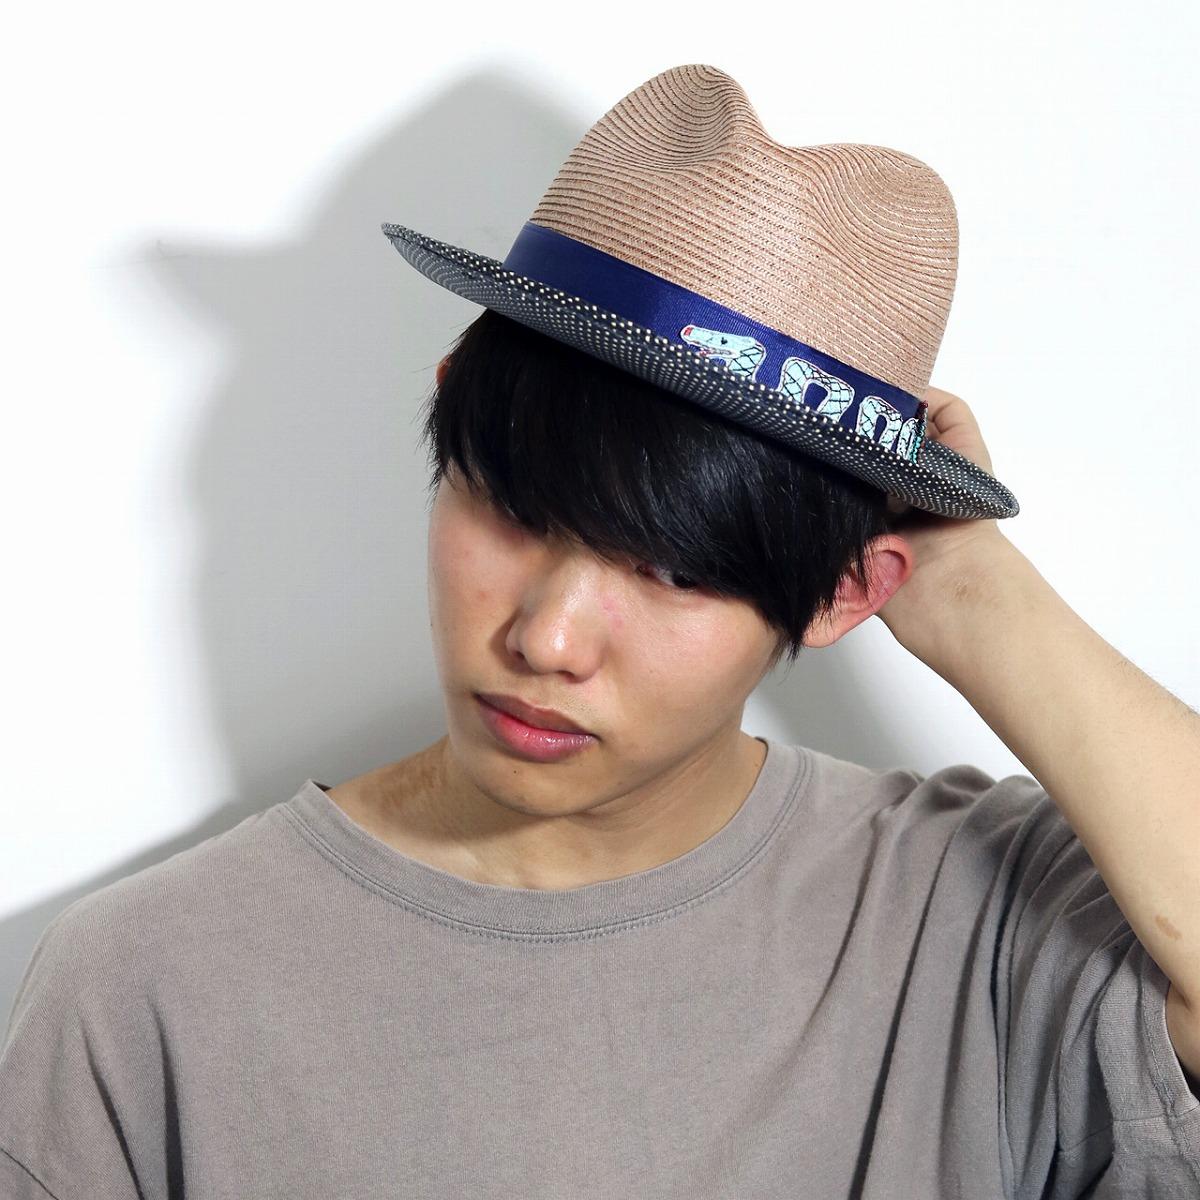 daaf0638278 2 soft felt hat hat men tone hemp import hemp blade CARLOS SANTANA straw  hats stylish individual Carlos Santana snake emblem ribbon soft felt hat  gentleman ...